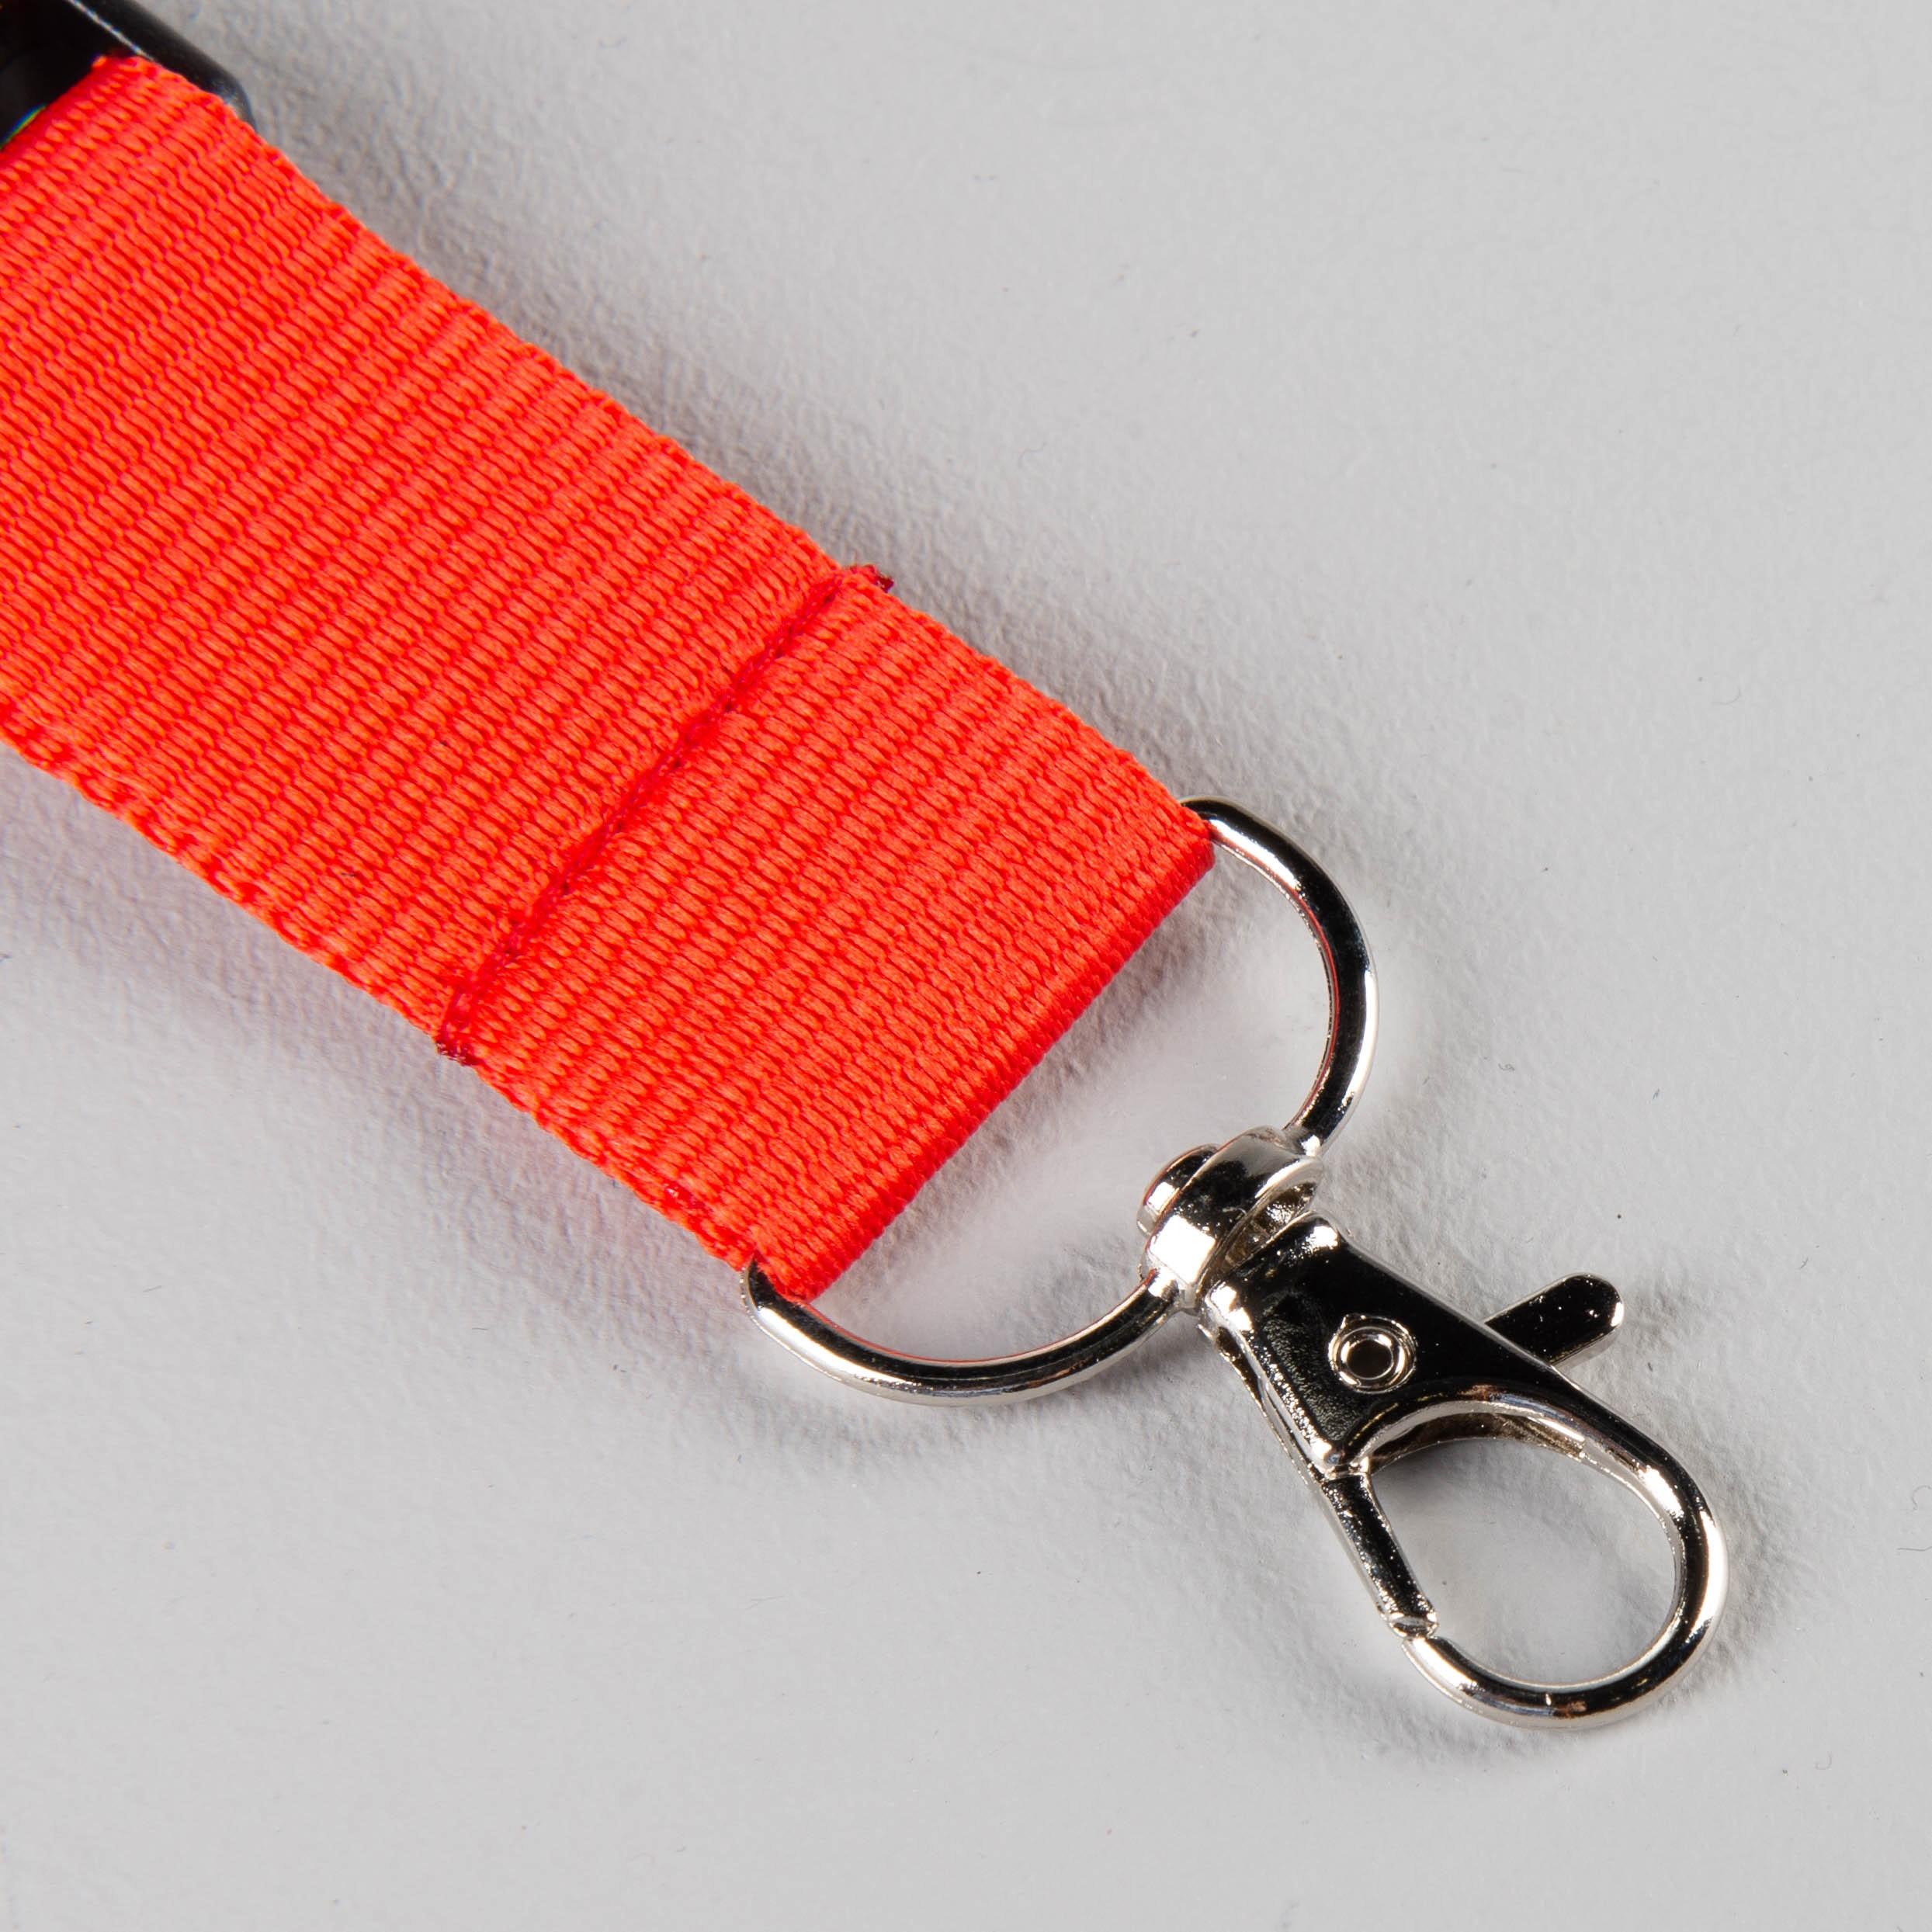 Alpinestars unisex-adult CORE LANYARD Key Chain